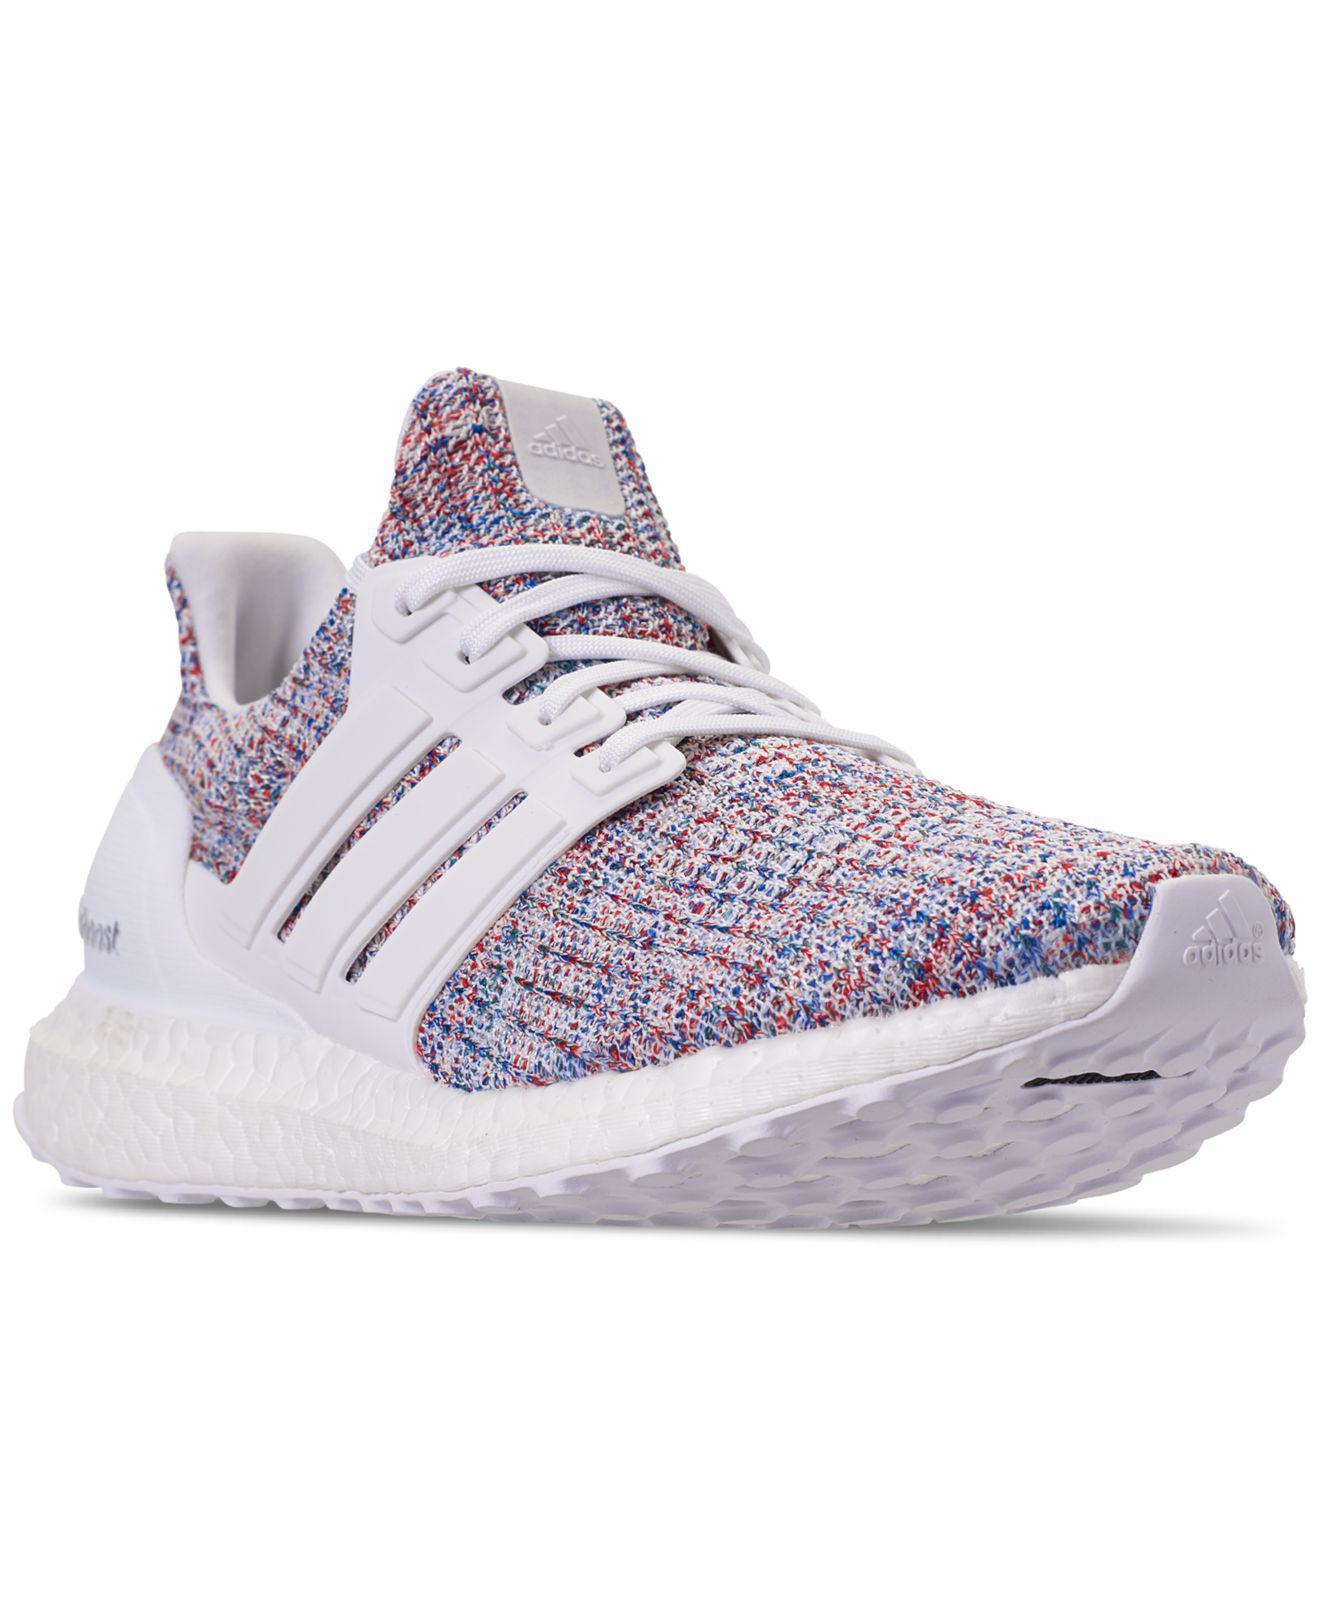 f9a060cb7e7 Lyst - adidas Men s Ultraboost Running Sneakers in White for Men ...